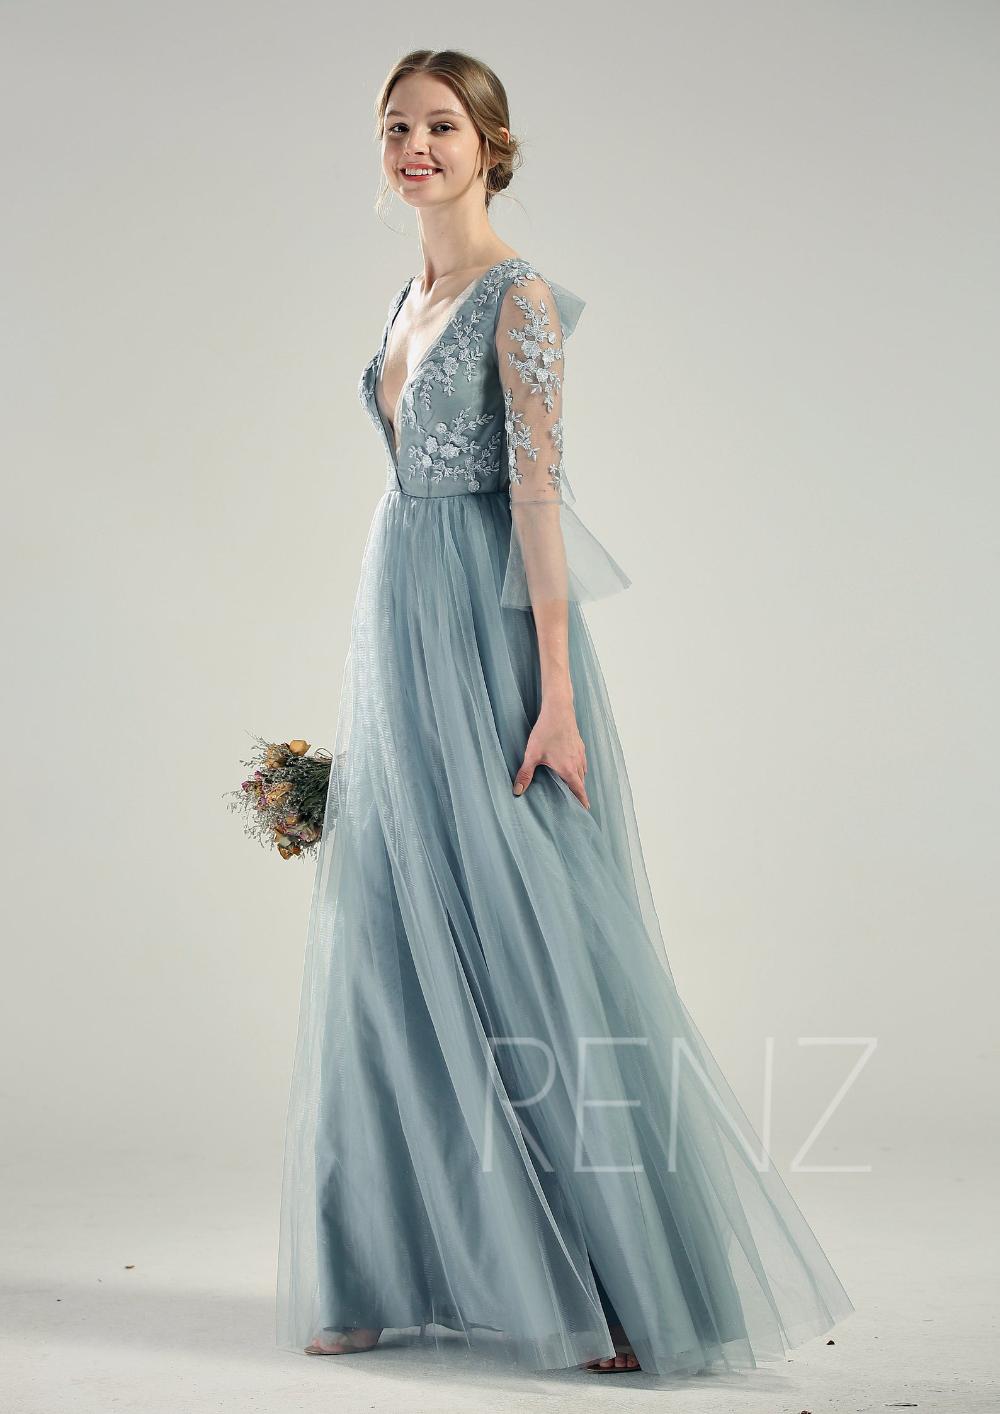 Blue Wedding Dress Long Sleeve Dusty Blue Bridesmaid Dress Etsy Dusty Blue Bridesmaid Dresses Blue Wedding Dresses Tulle Wedding Gown [ 1414 x 1000 Pixel ]